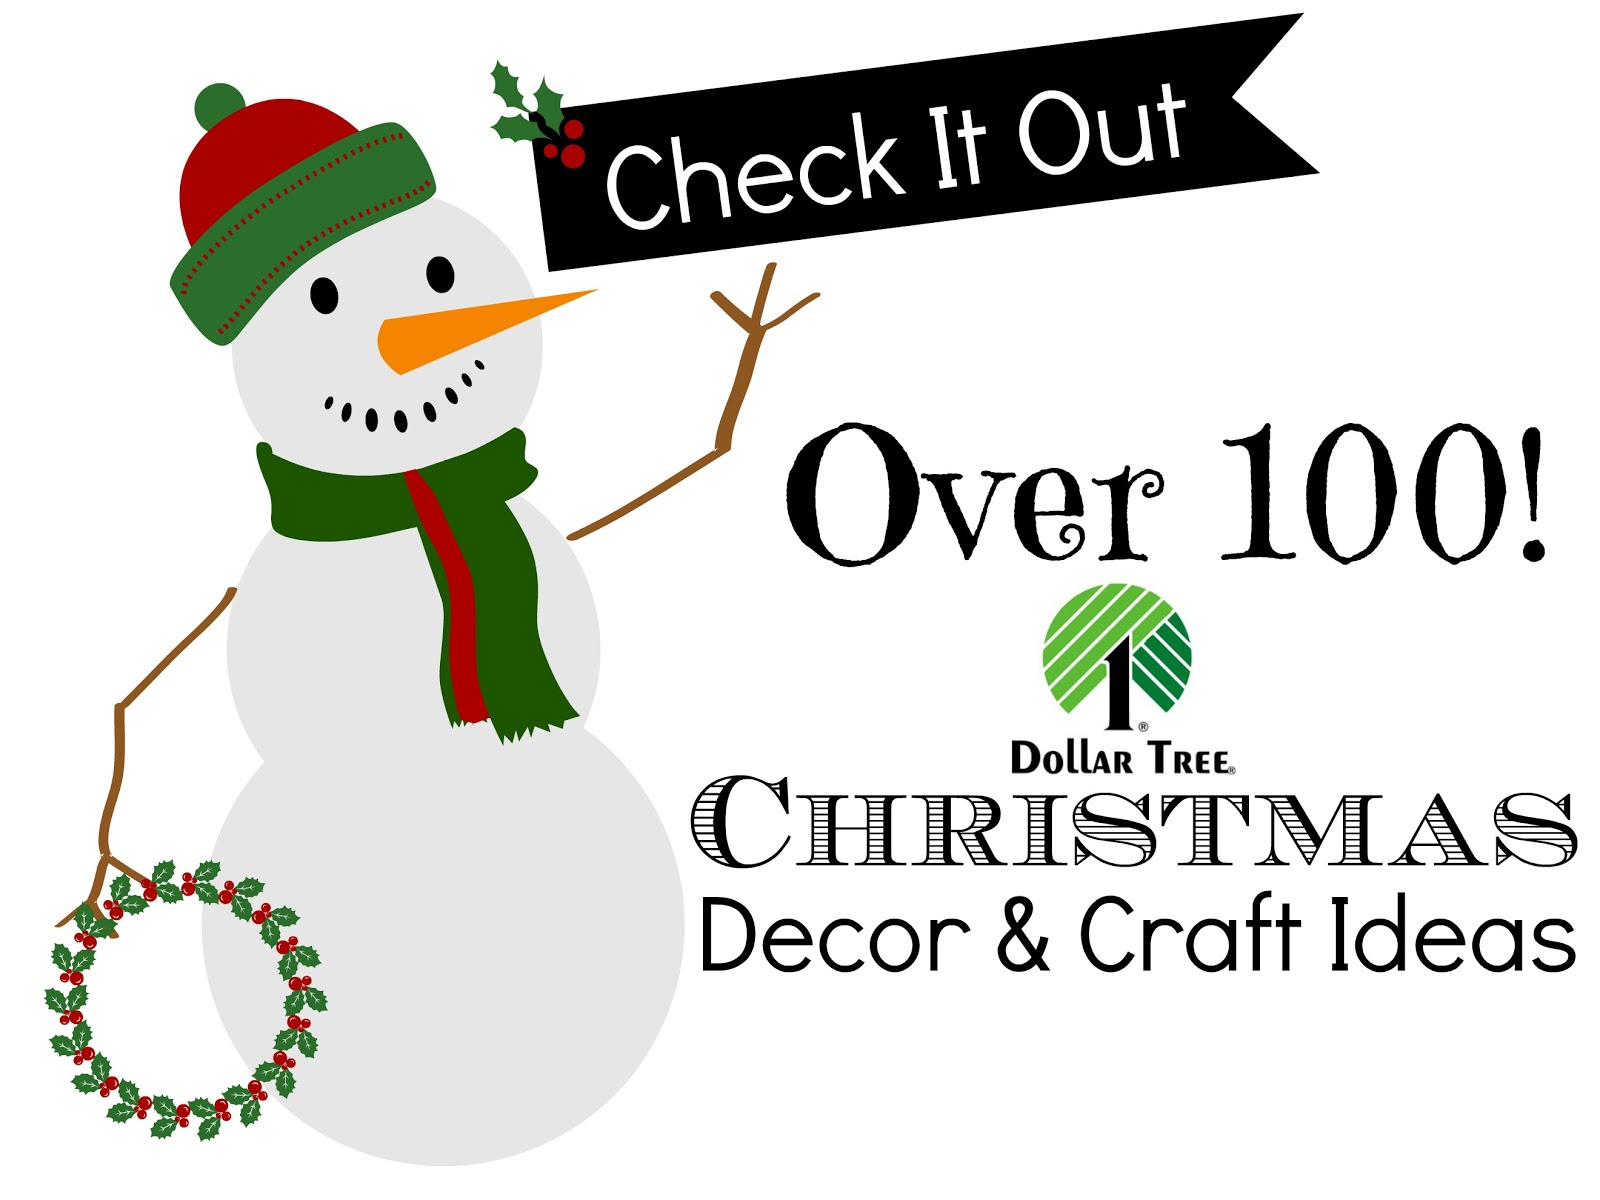 Dollar tree 100 christmas decor and craft ideas fox hollow cottage jpg